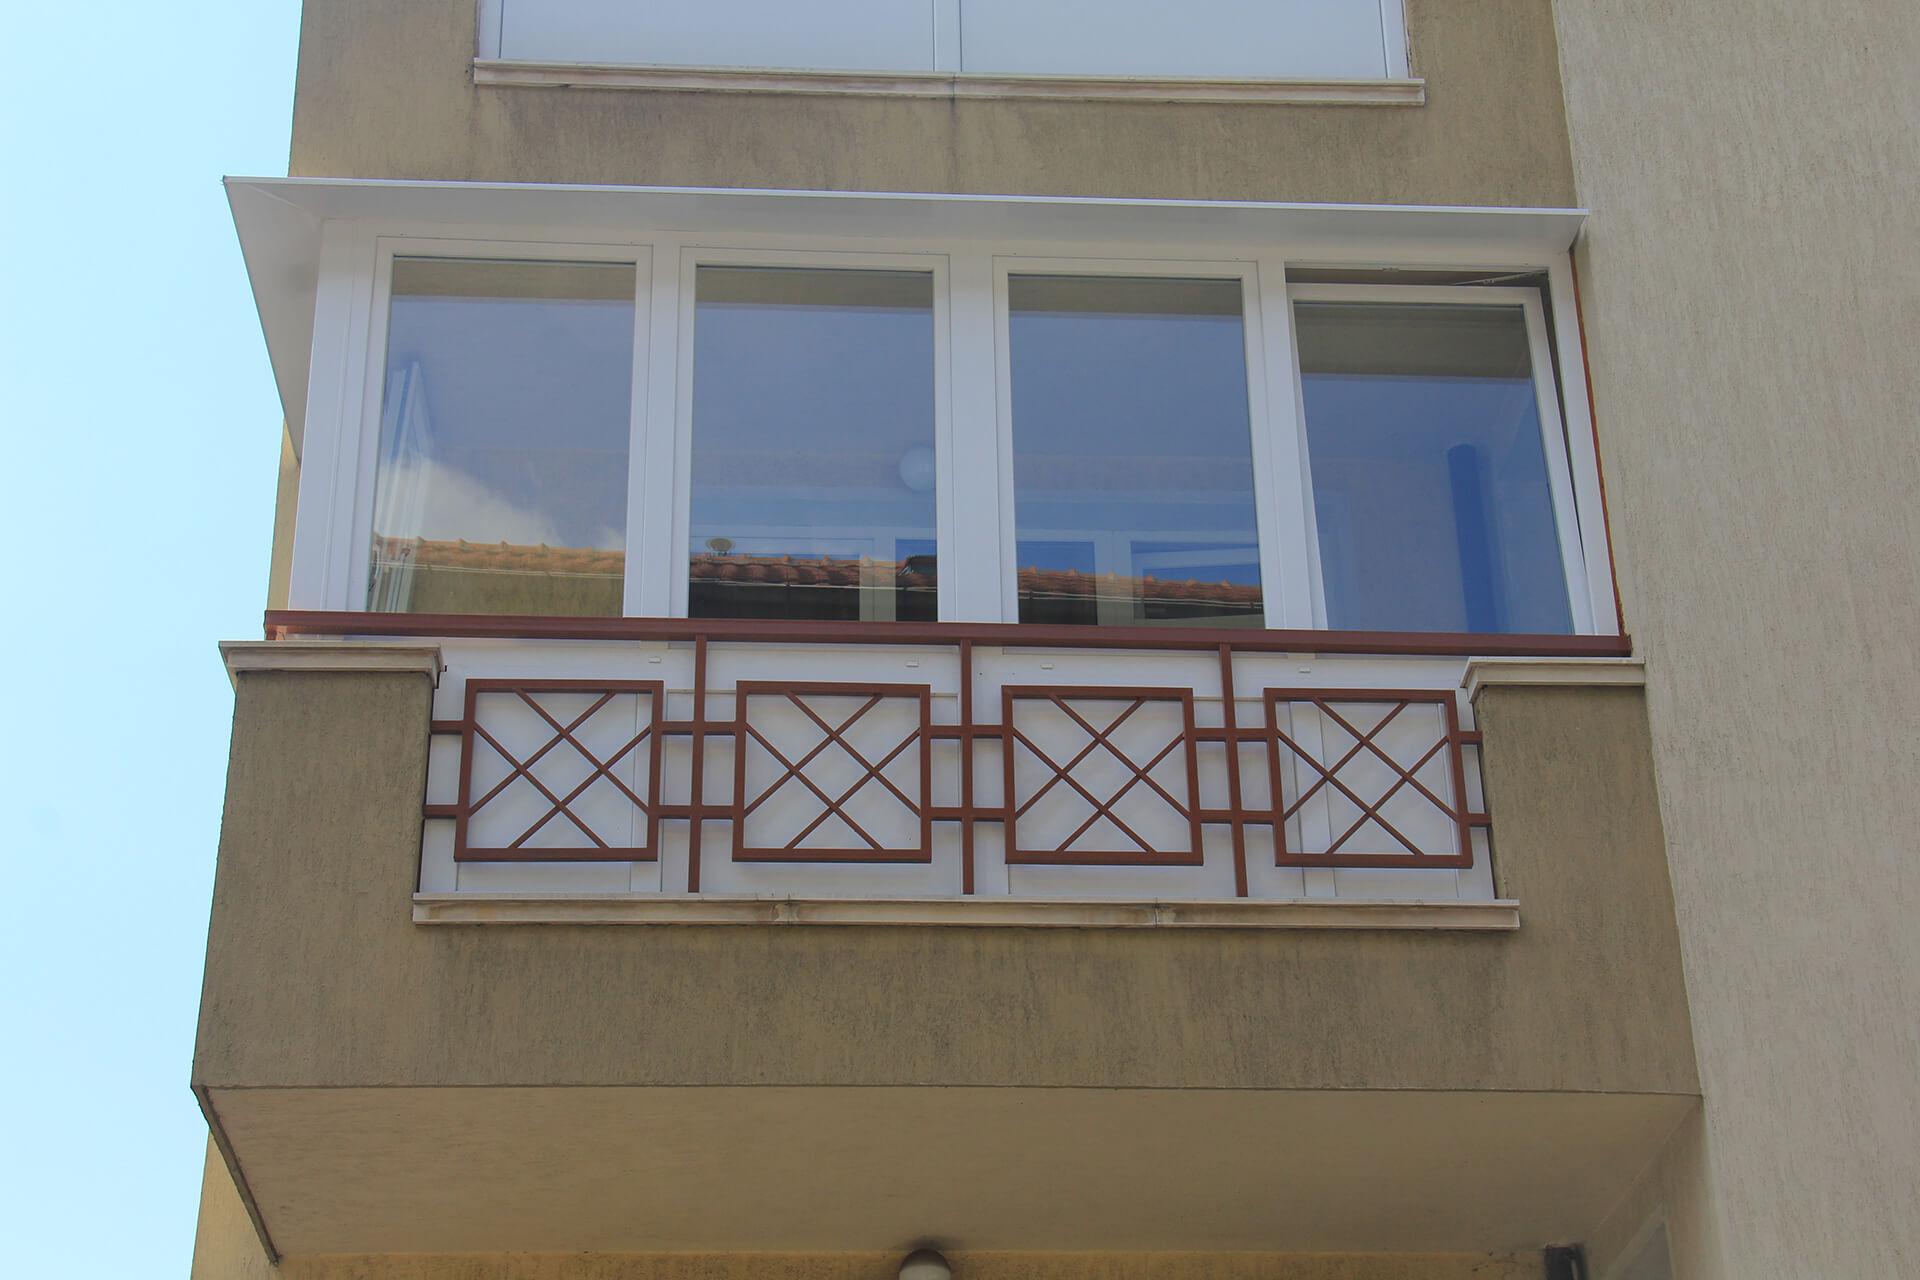 Частен дом ж. к. Редута, оборудван с пвц прозоречни системи